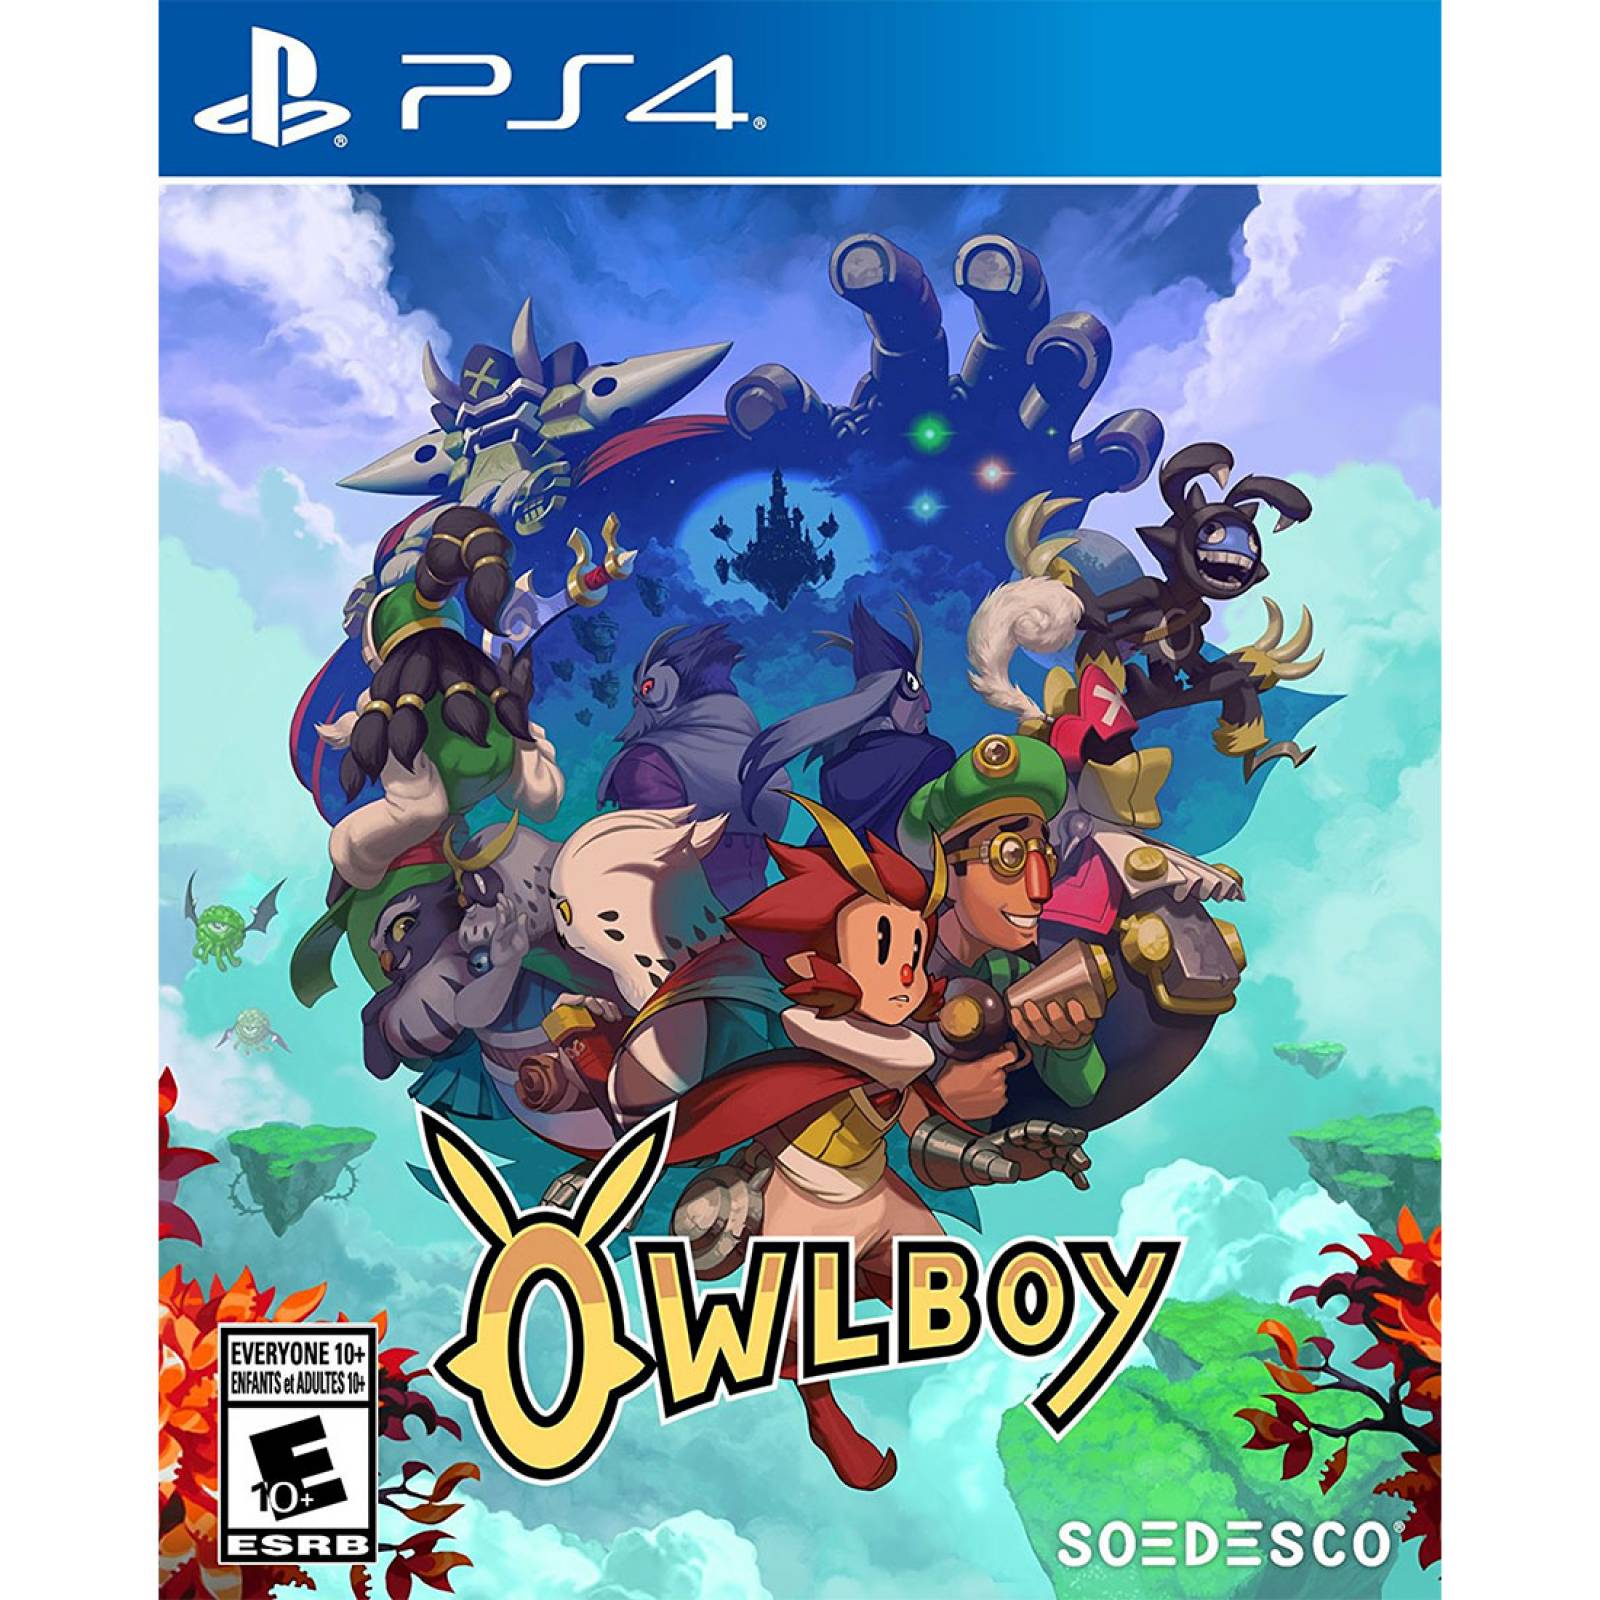 Juego Owlboy Play Station 4 Ibushak Gaming